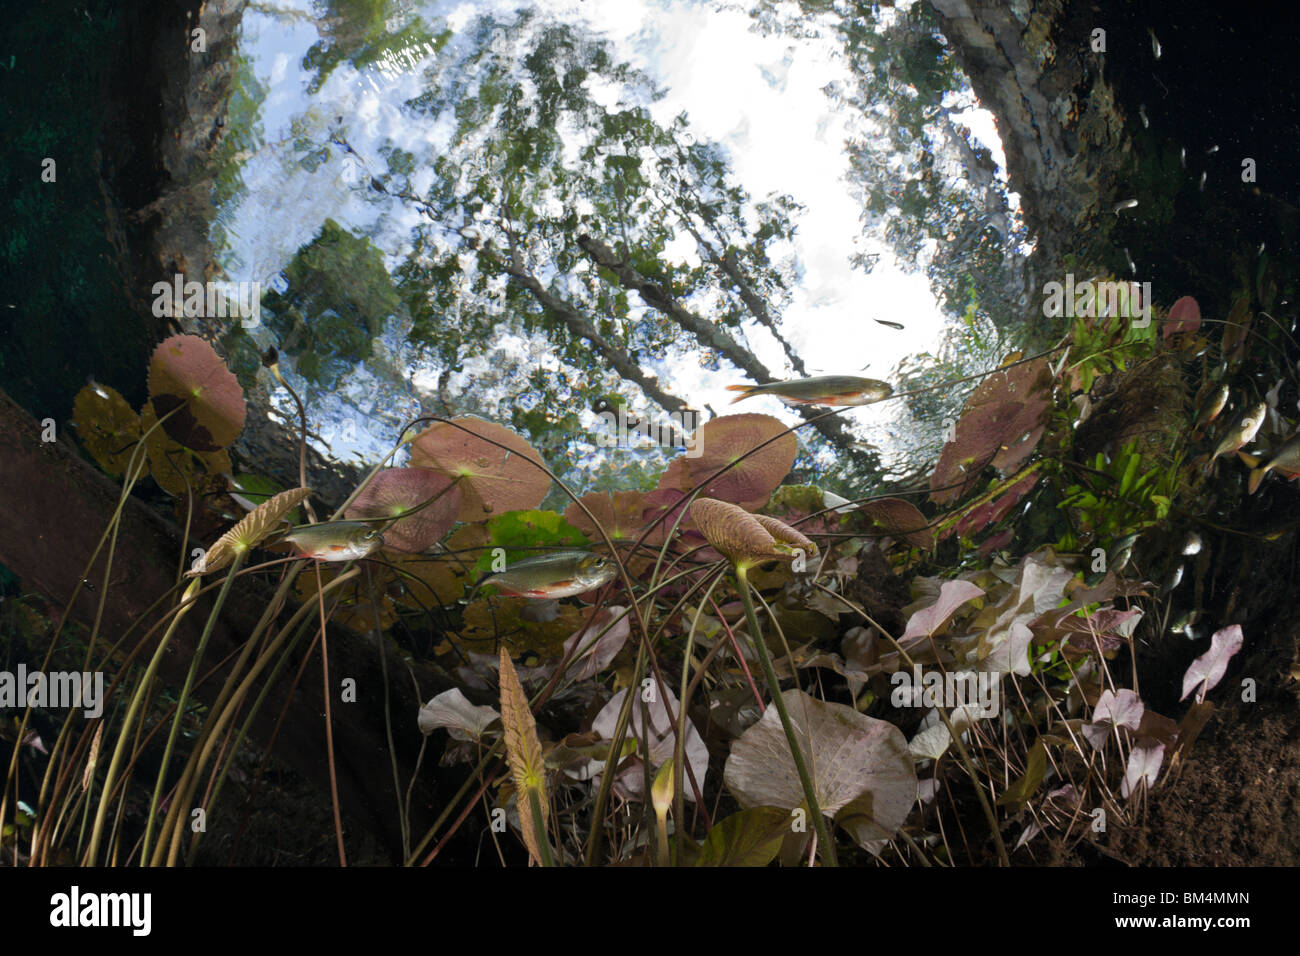 Water Lilies and Shoal of Tetra in Gran Cenote, Astyanax aeneus, Tulum, Yucatan Peninsula, Mexico - Stock Image